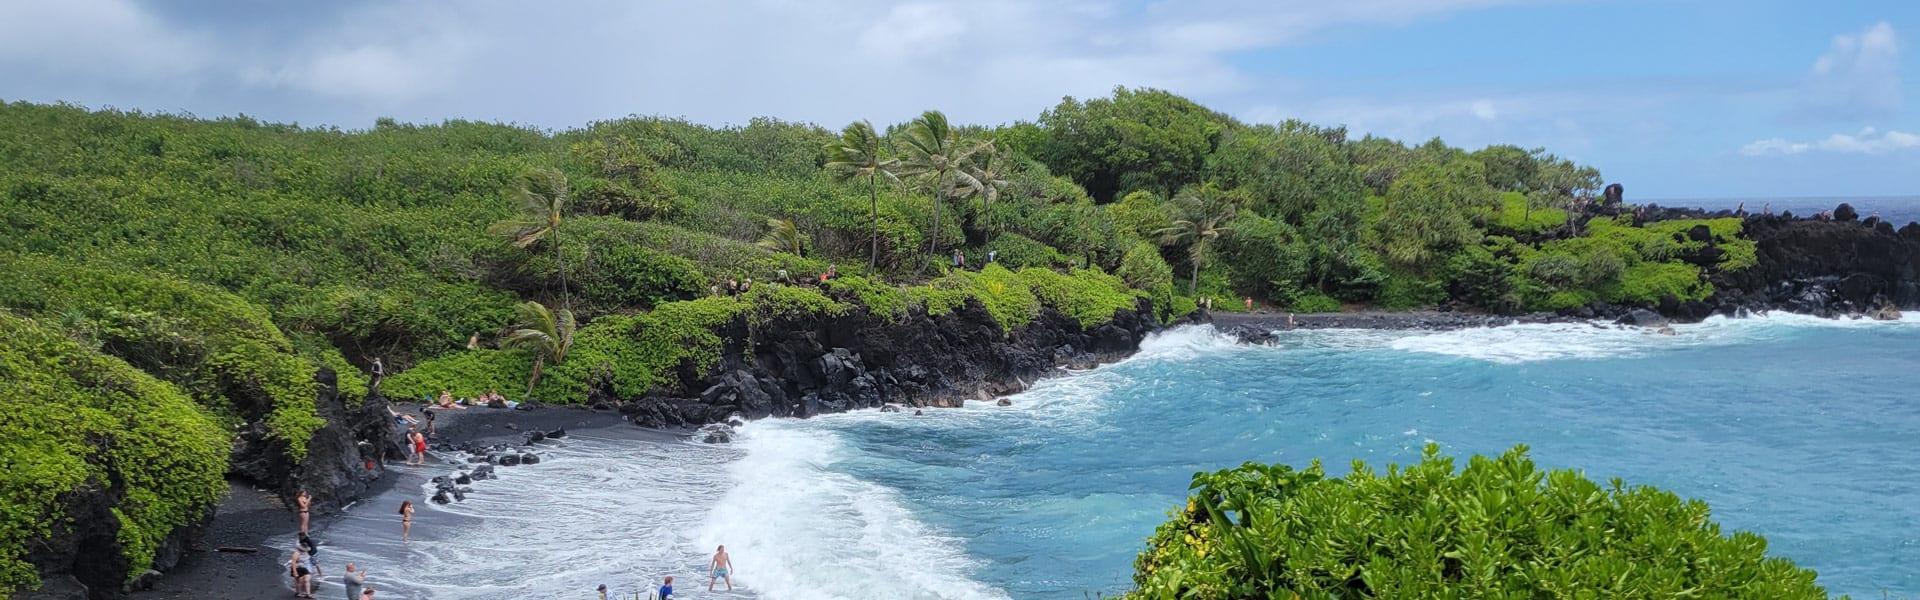 Hawaii vacation on the beach